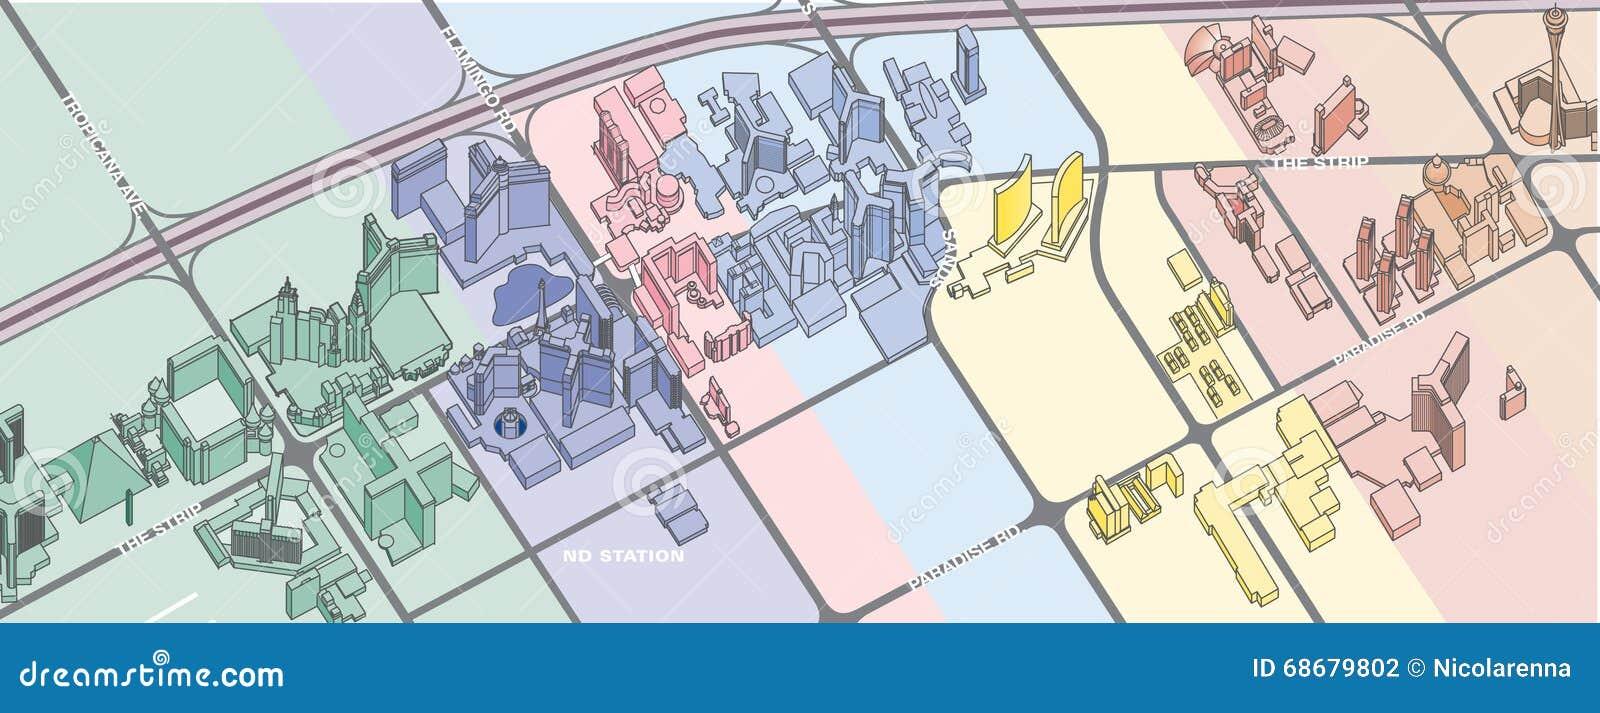 The Park Las Vegas Map.Las Vegas Map Stock Illustration Illustration Of Park 68679802